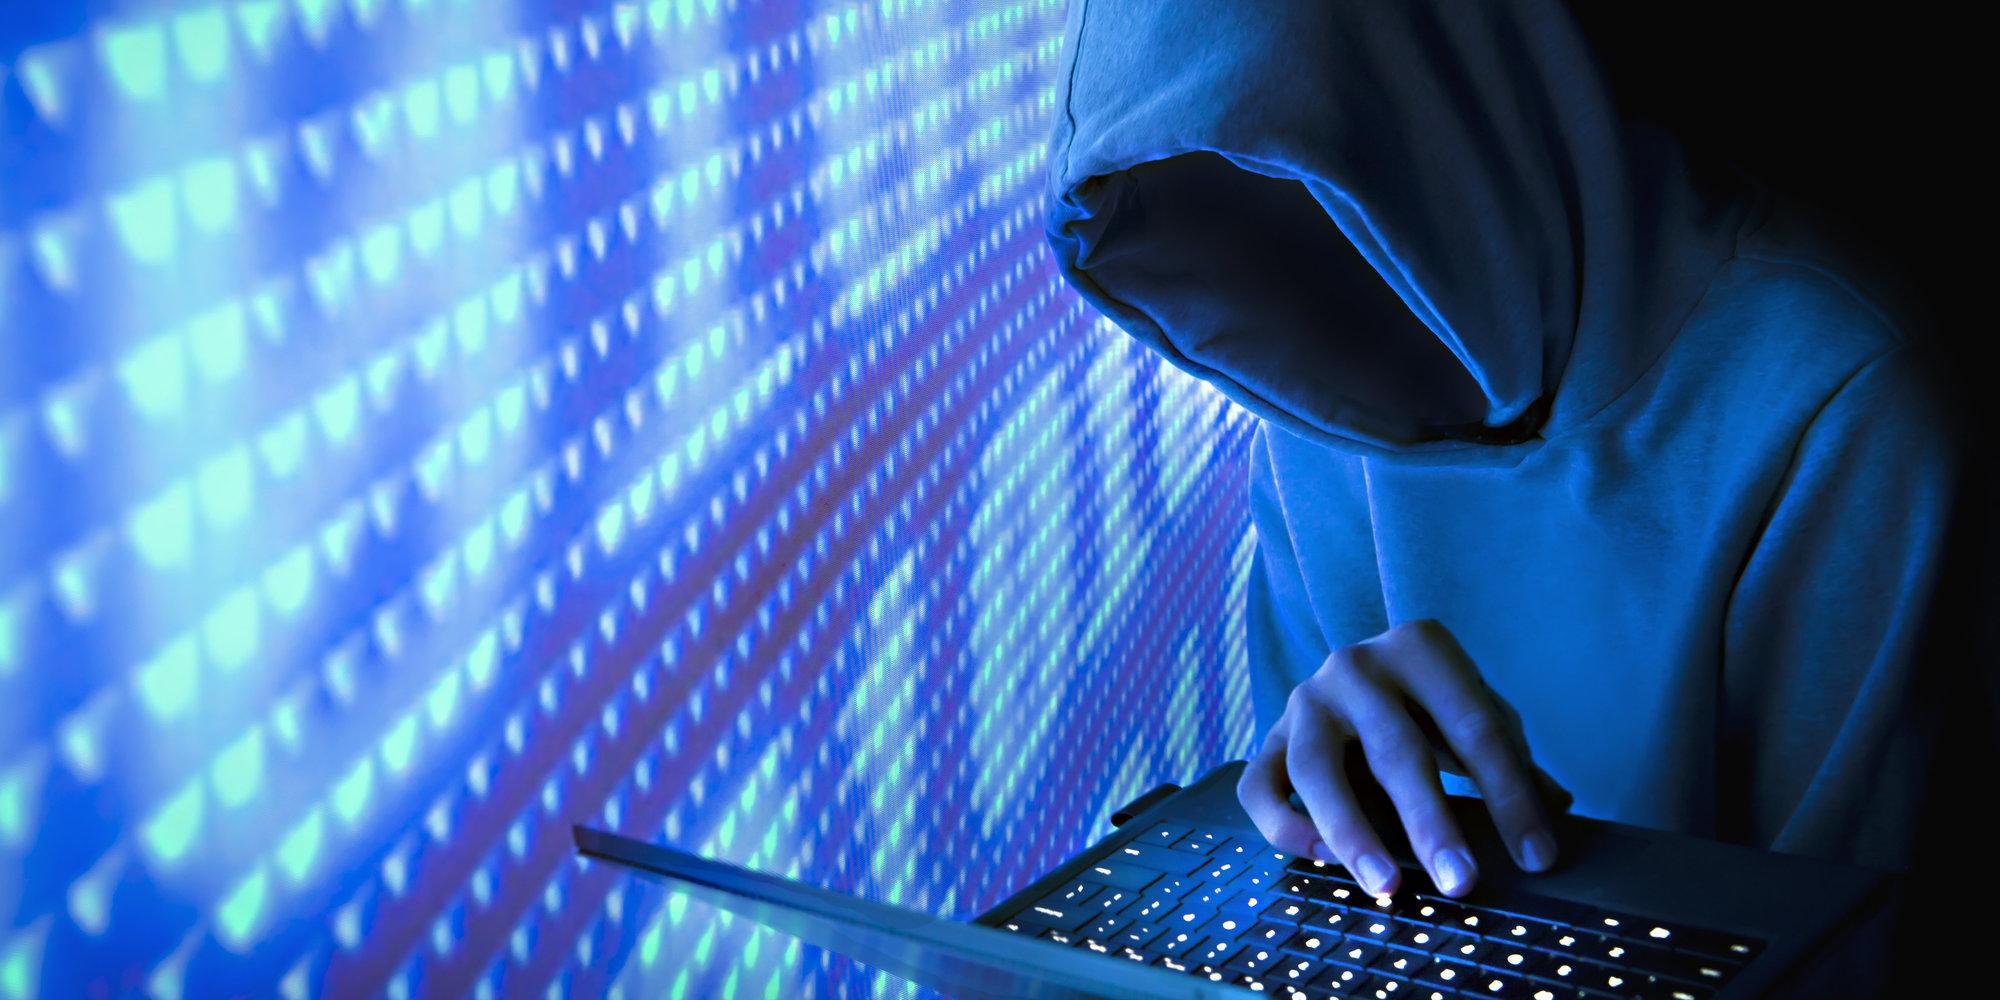 Denmark accuses Russia of hacking defense